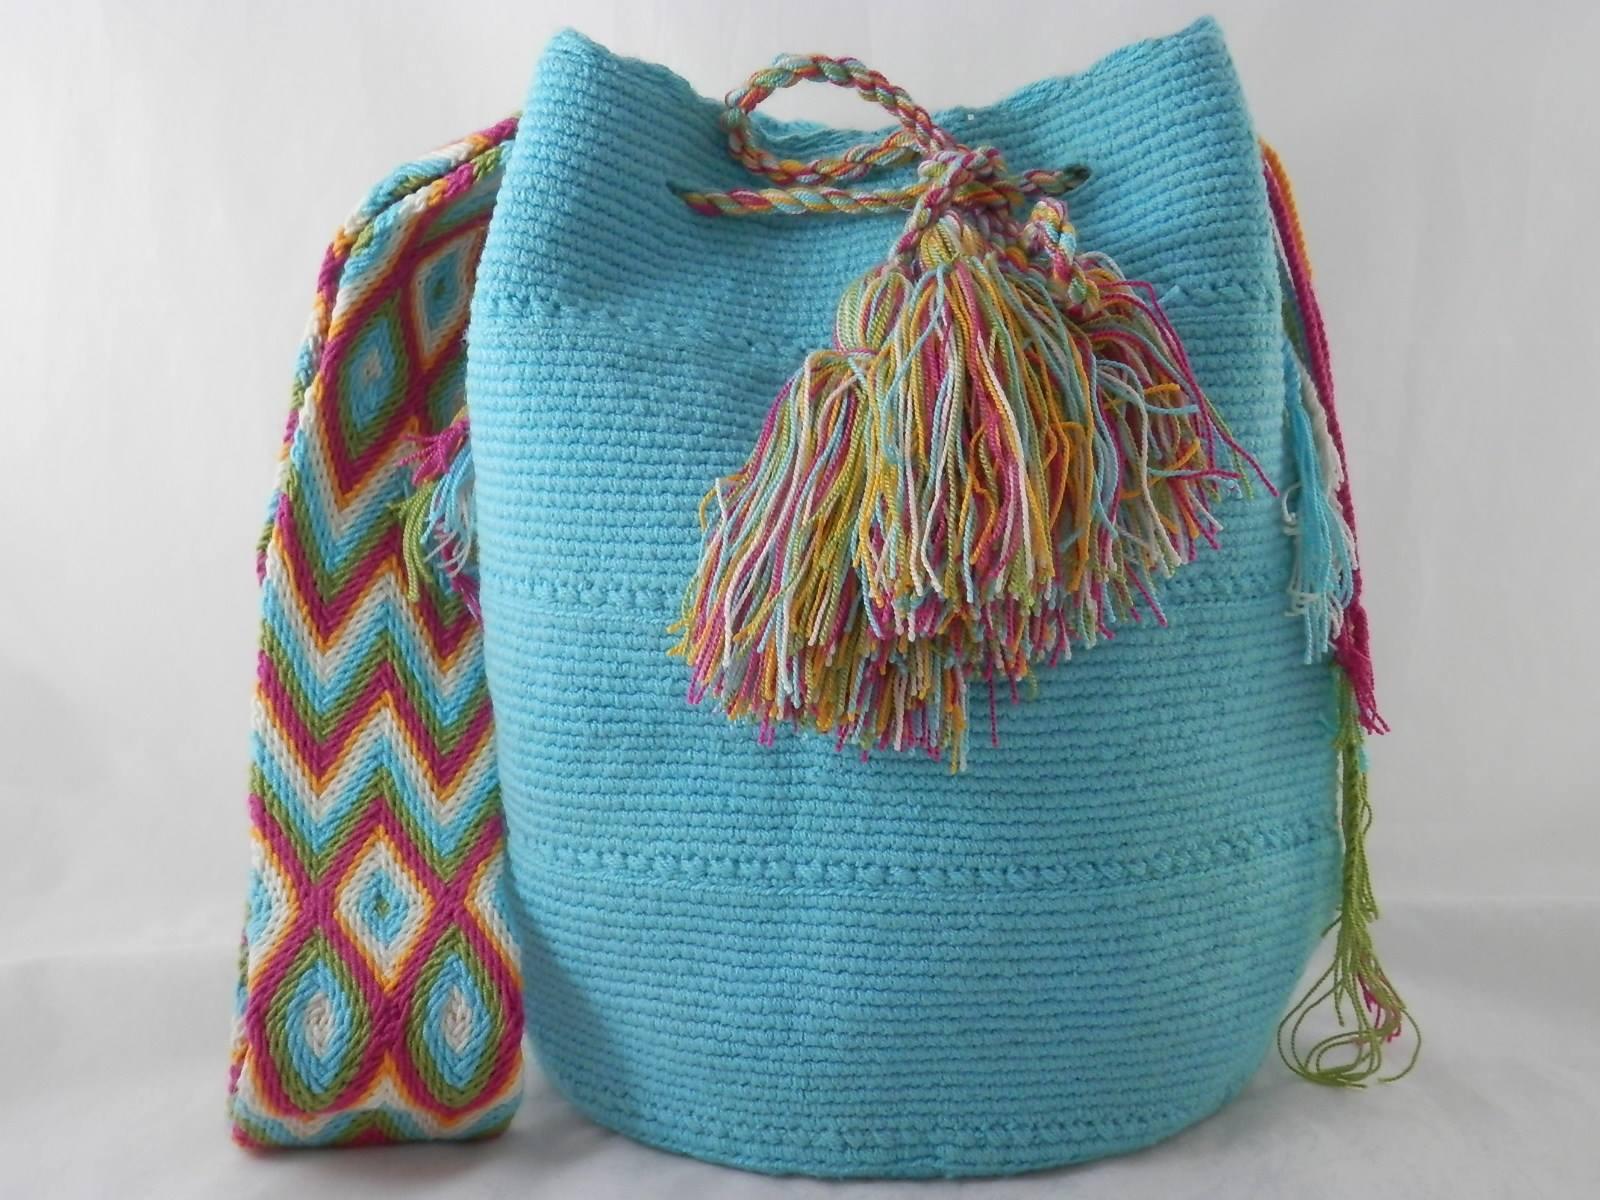 Wayuu Bag by PPS-MG_9192